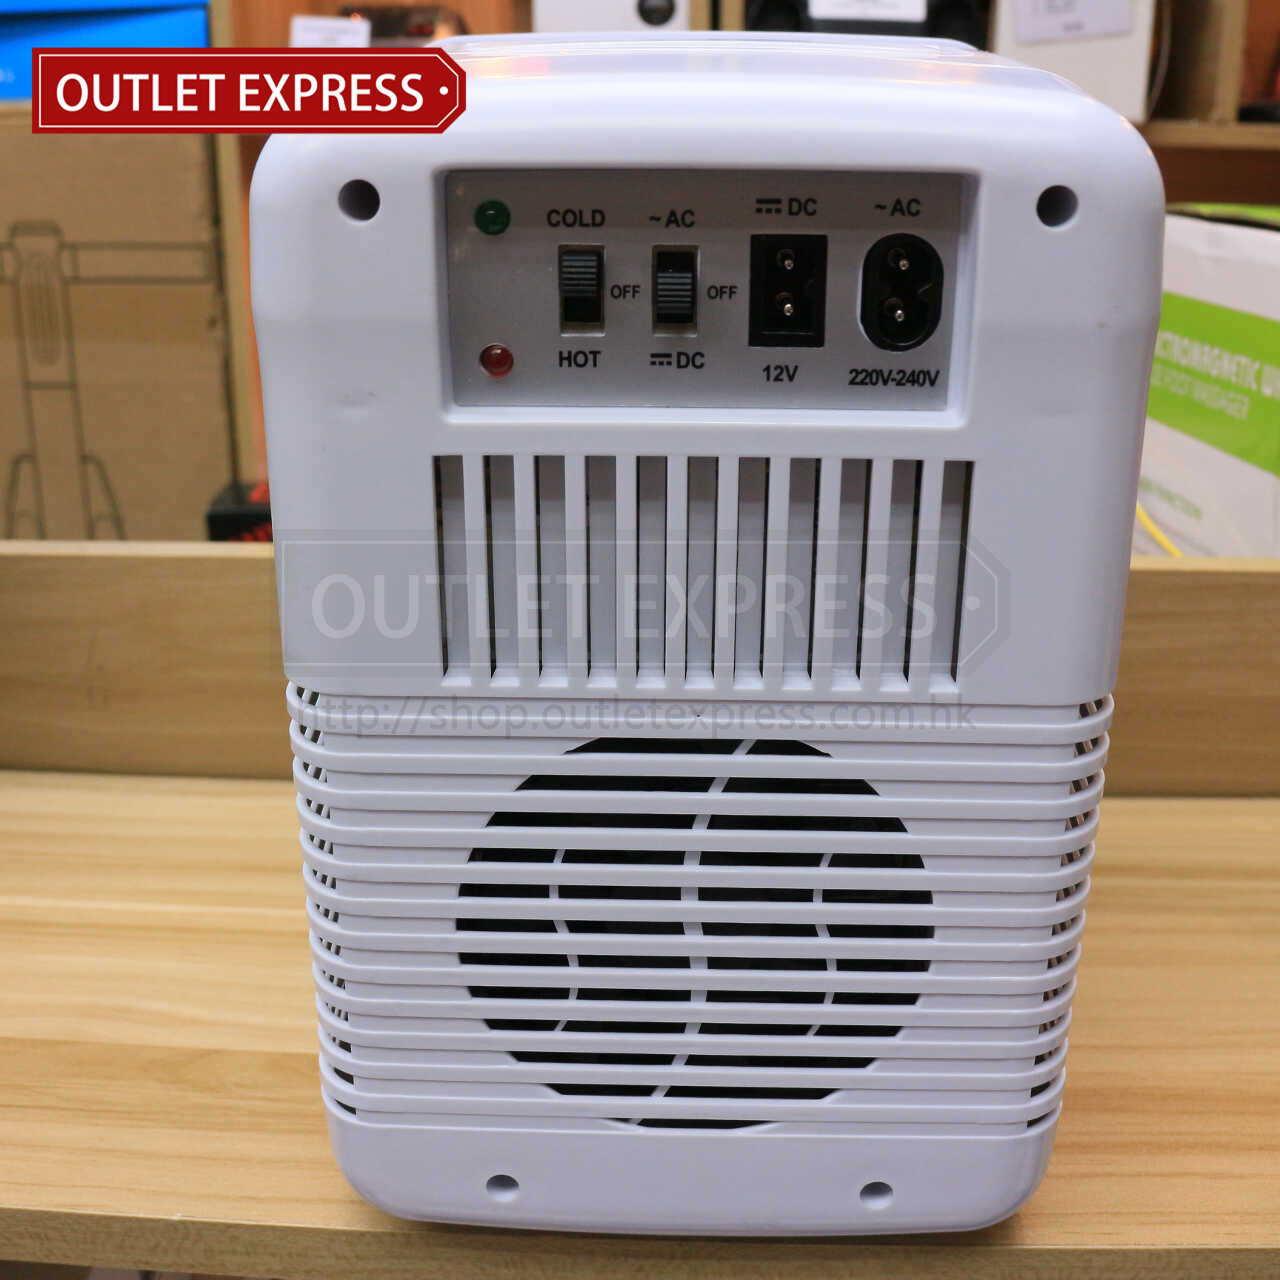 4L 冷暖兩用迷你小雪櫃 | 可車載或家用 背面圖 - Outlet Express HK生活百貨城實拍相片